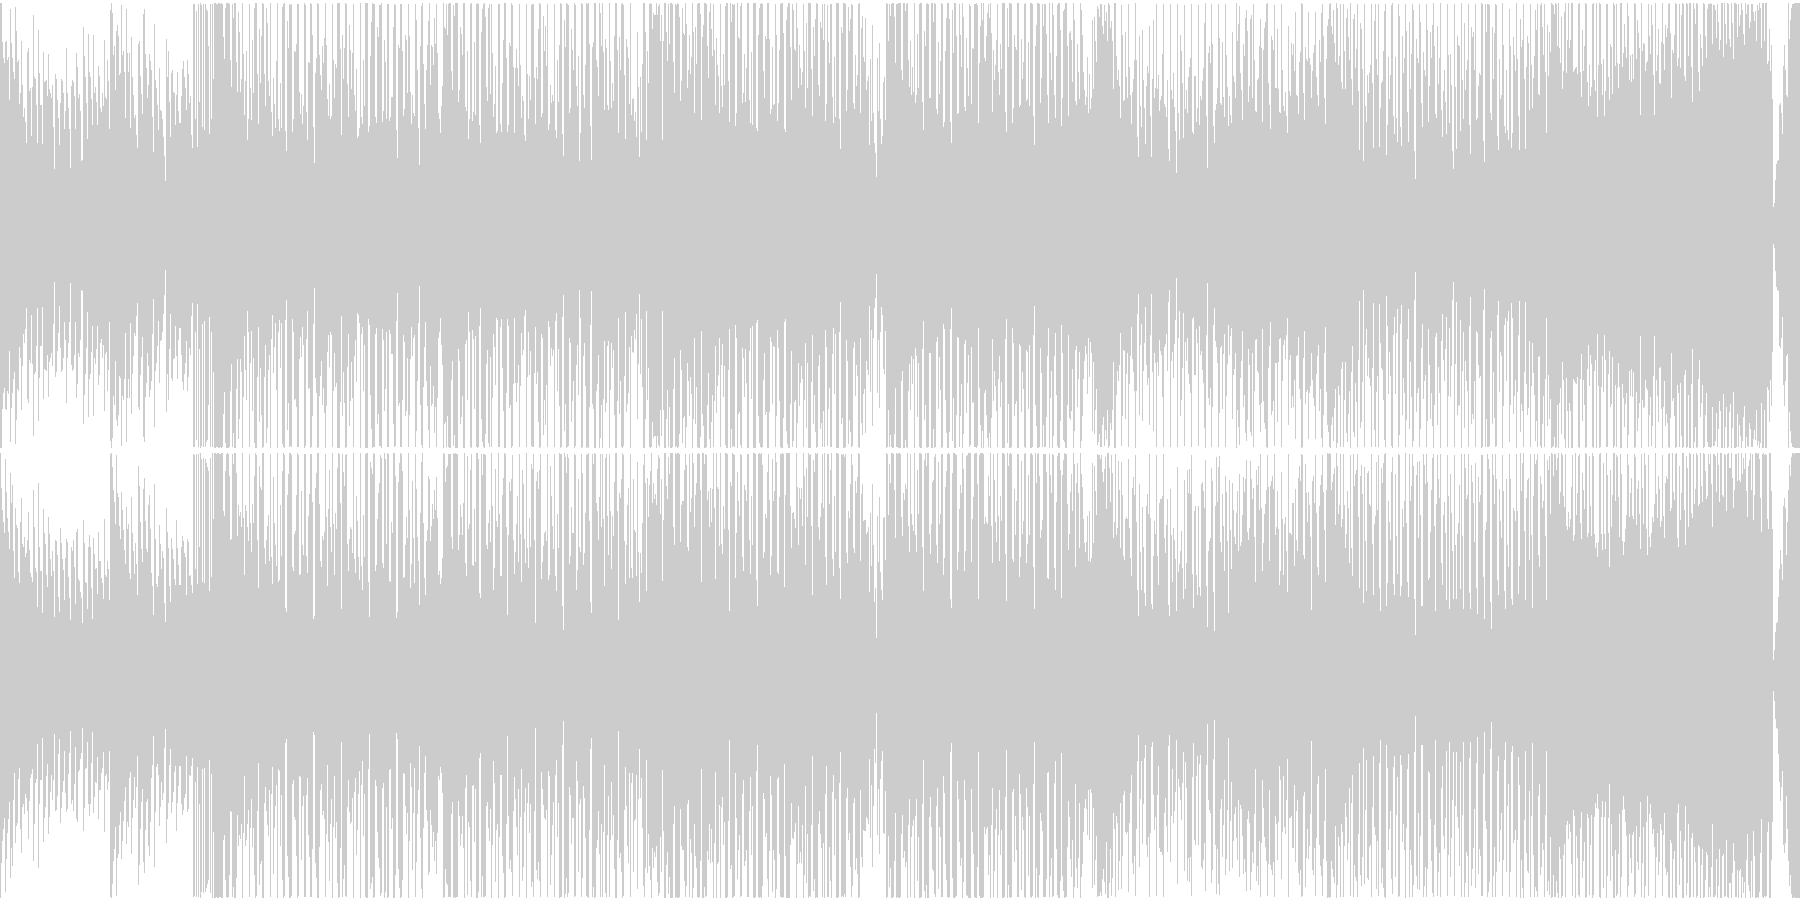 EDM ピアノ スポーツ バラエティLPの未再生の波形